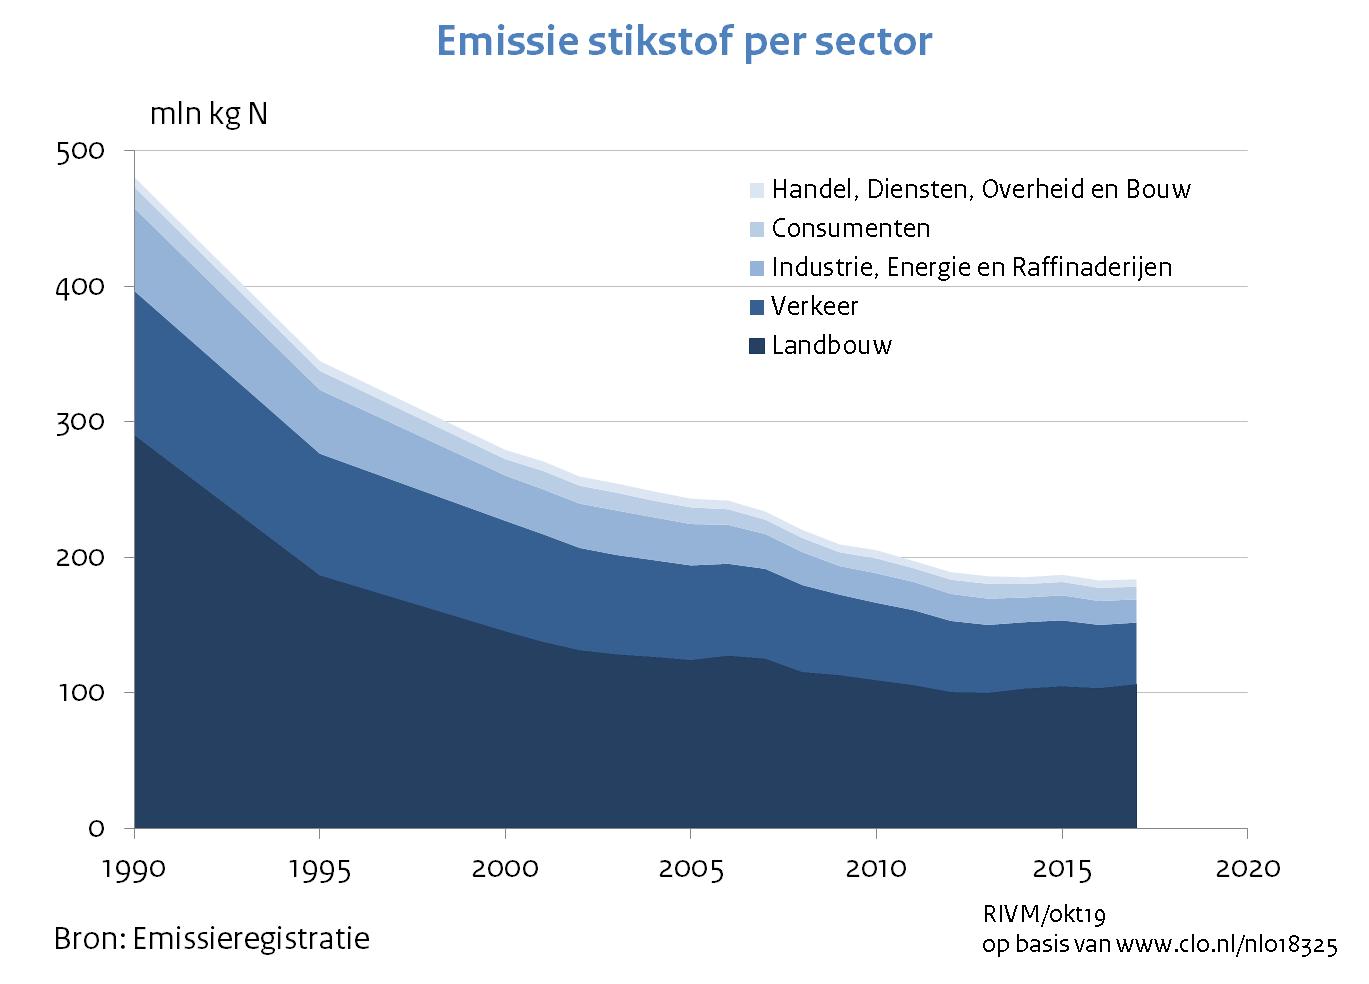 https://www.rivm.nl/sites/default/files/2019-10/grafiek_emissie_stikstof_per_sector_1.png